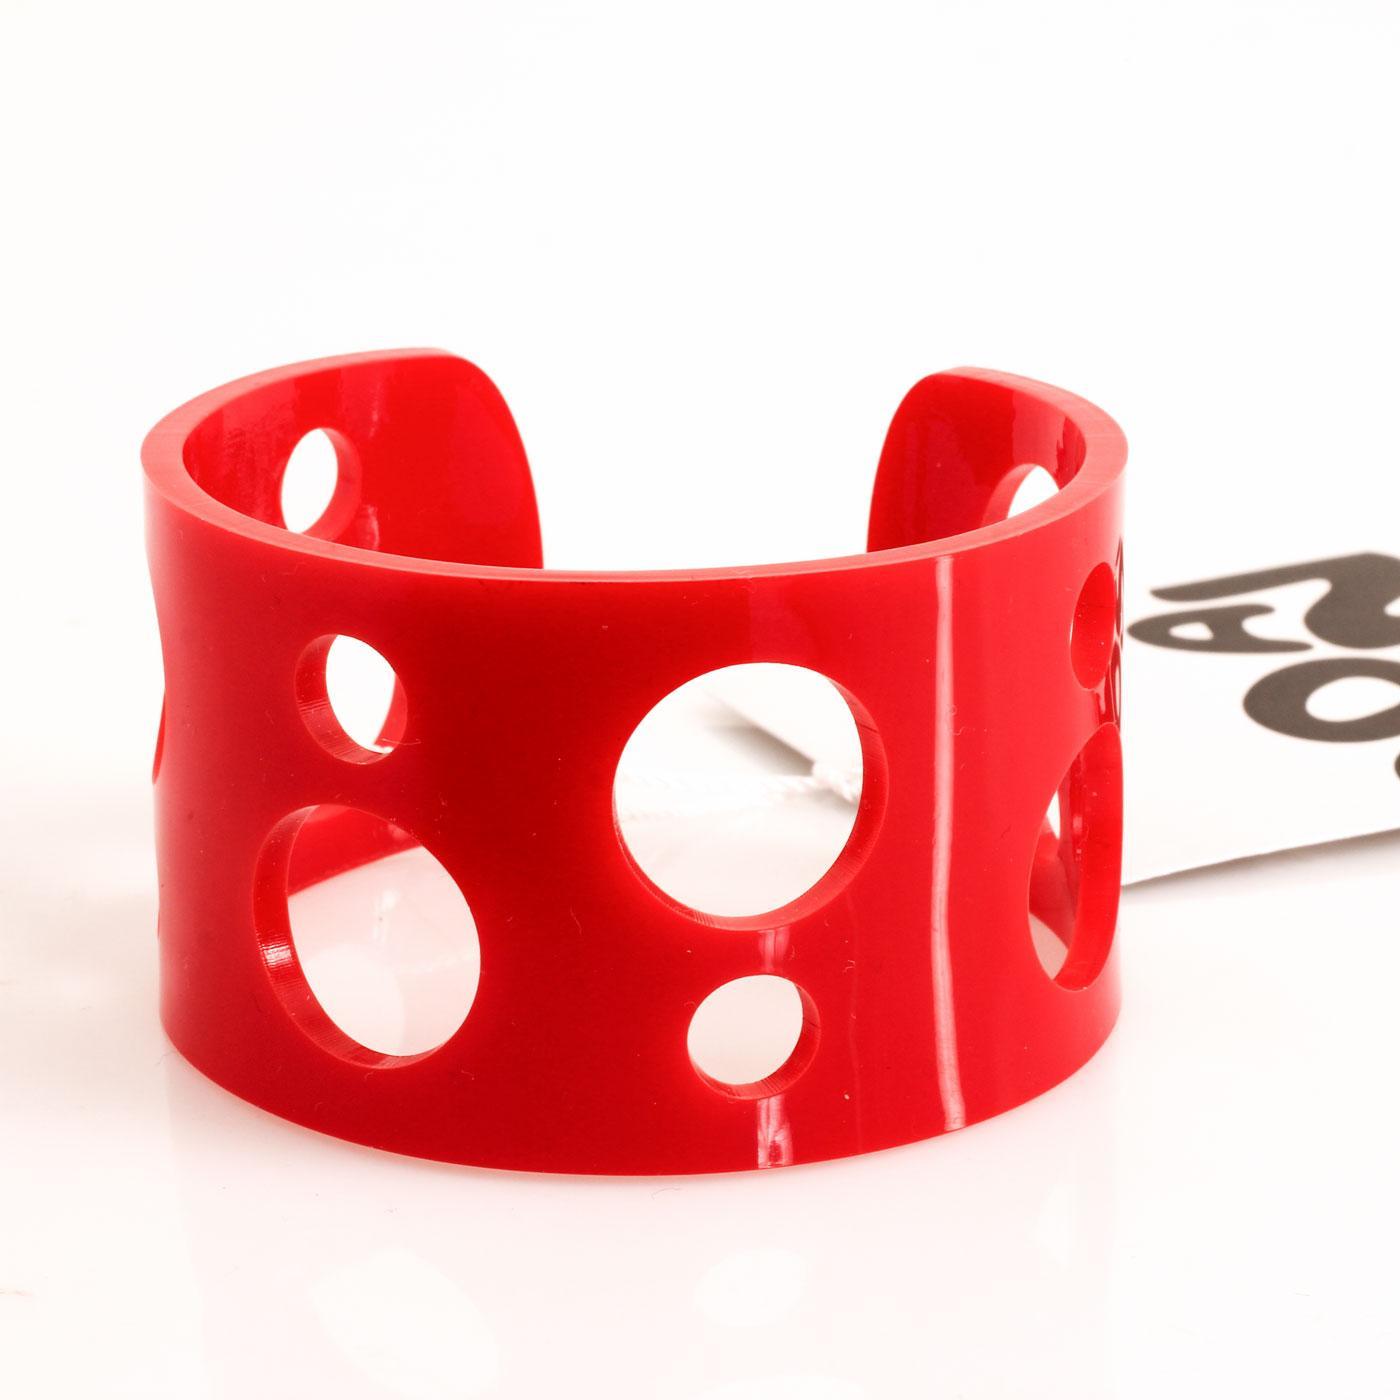 ADA BINKS for MADCAP ENGLAND 60s Cuff Bracelet R